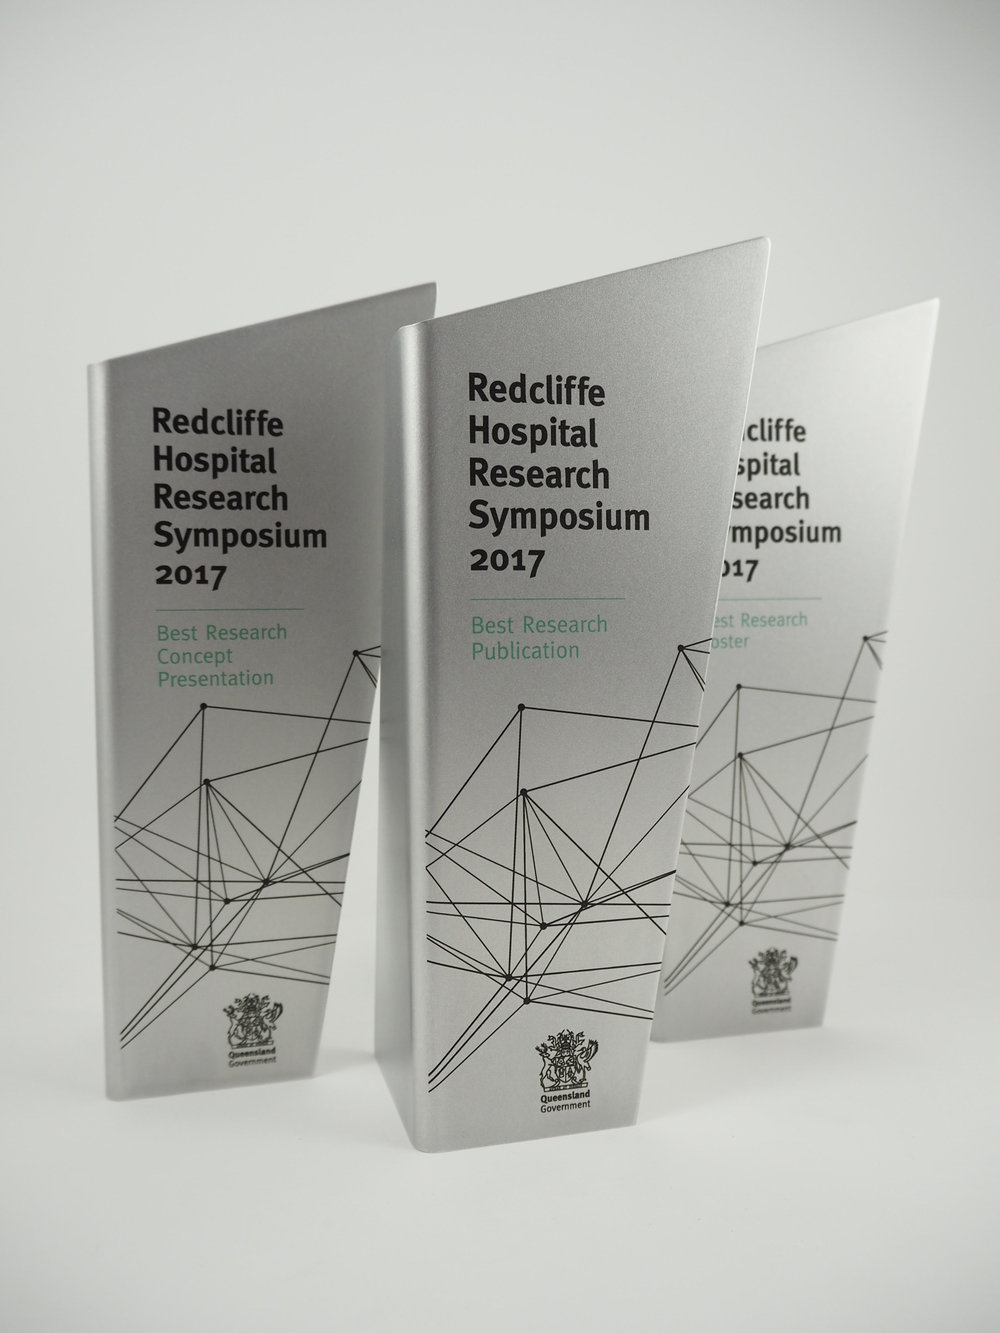 Redcliffe-Hospital-Symposium-eco-aluminium-trophy-award-01.jpg